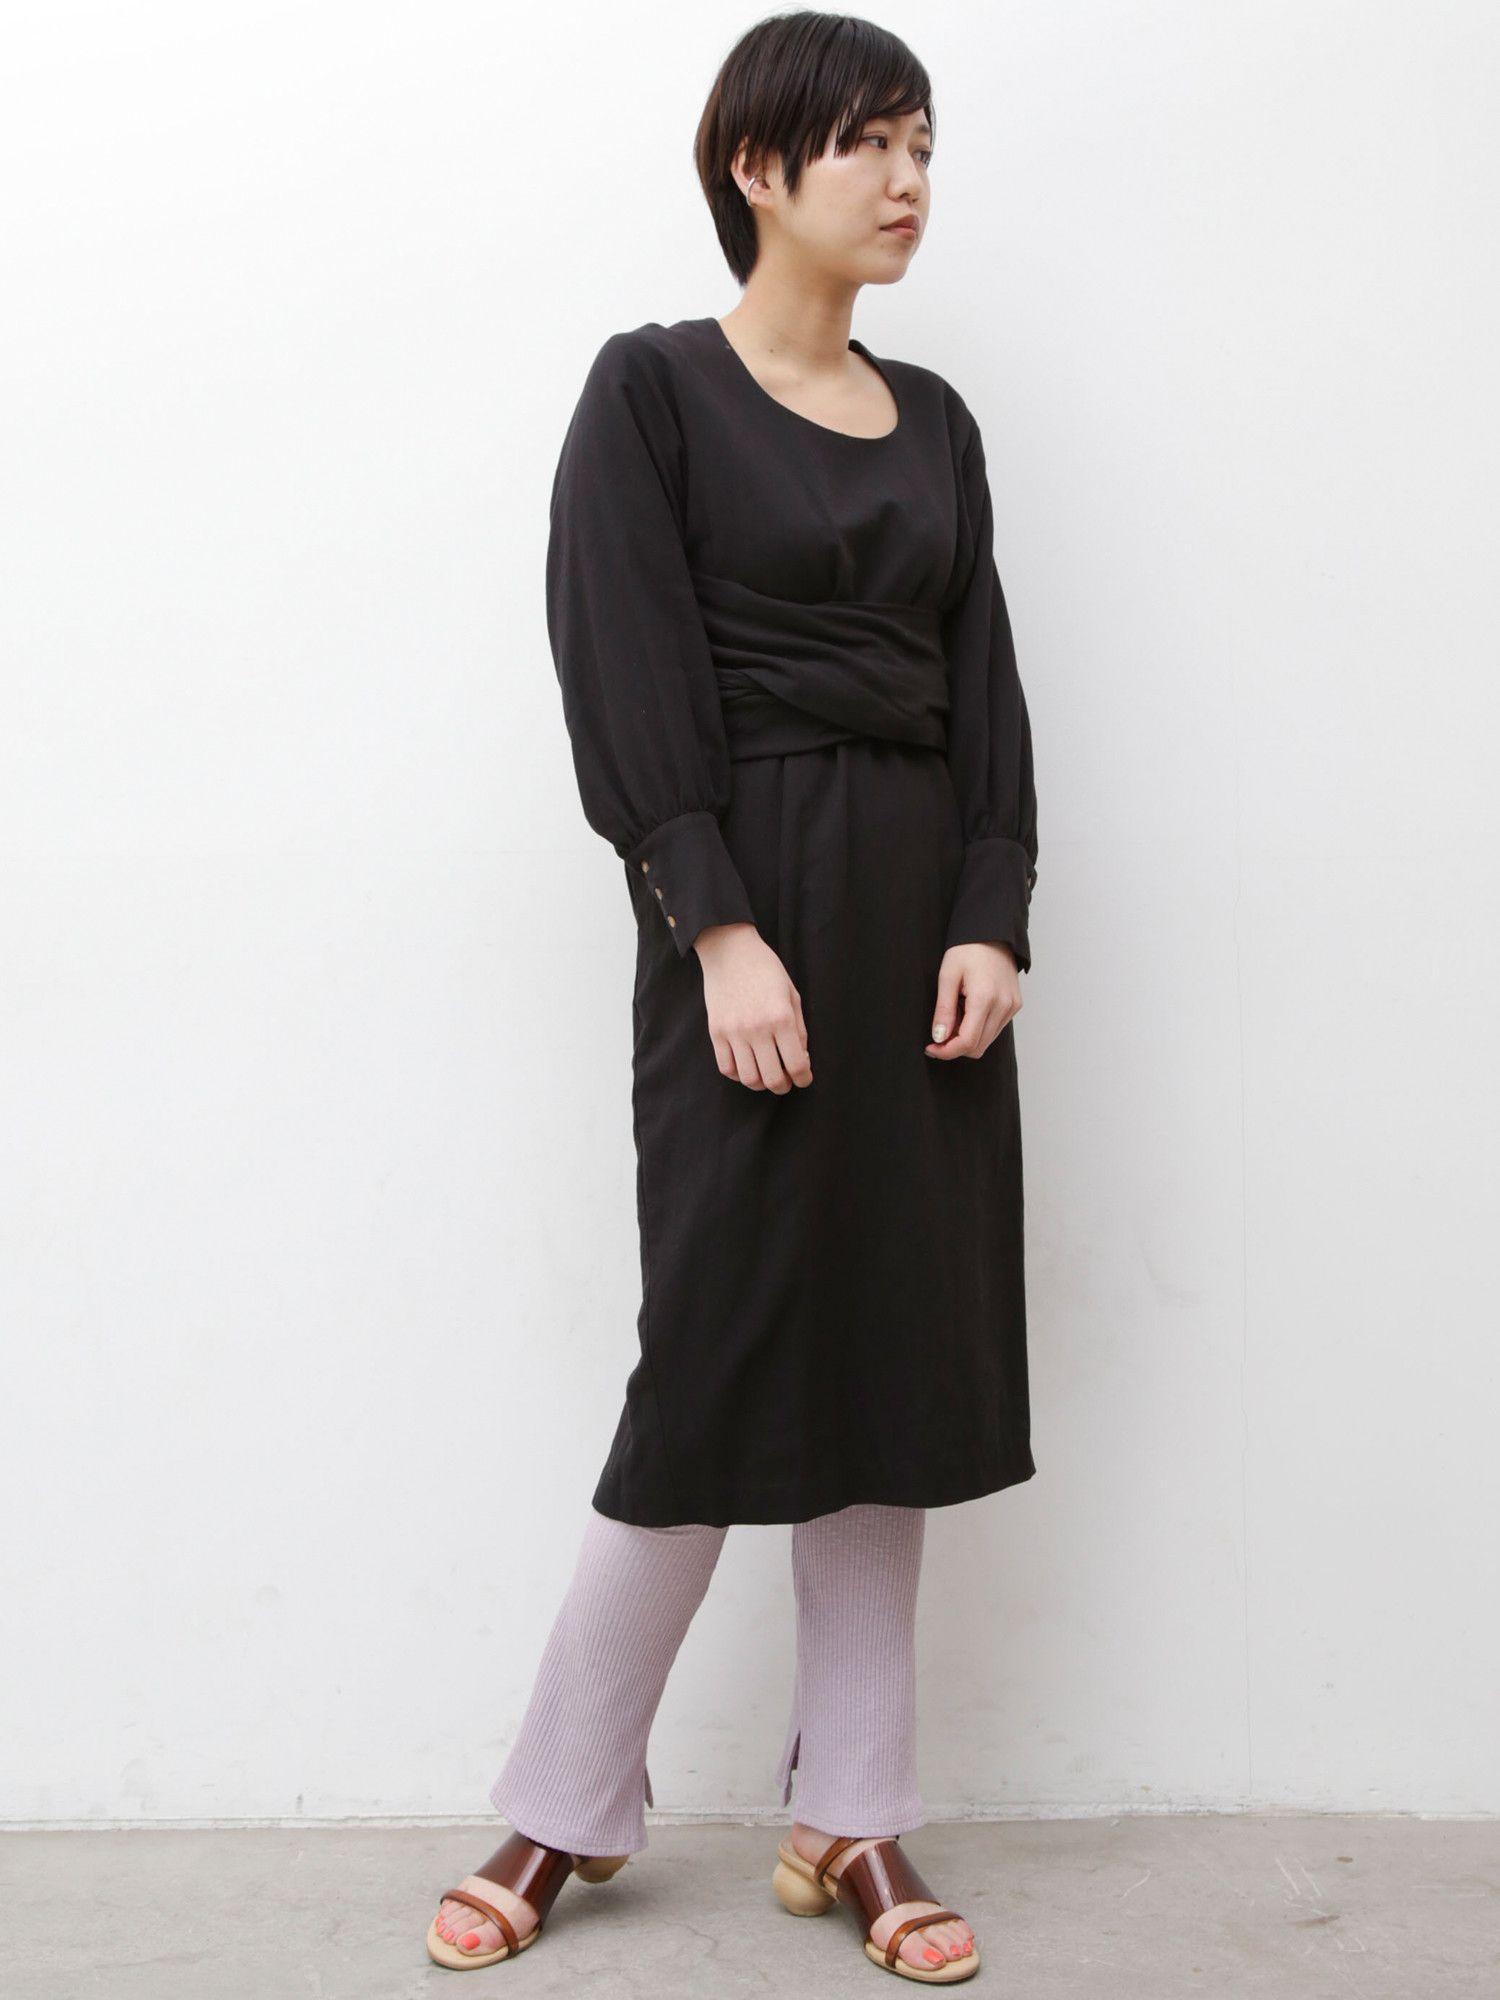 West sash dress